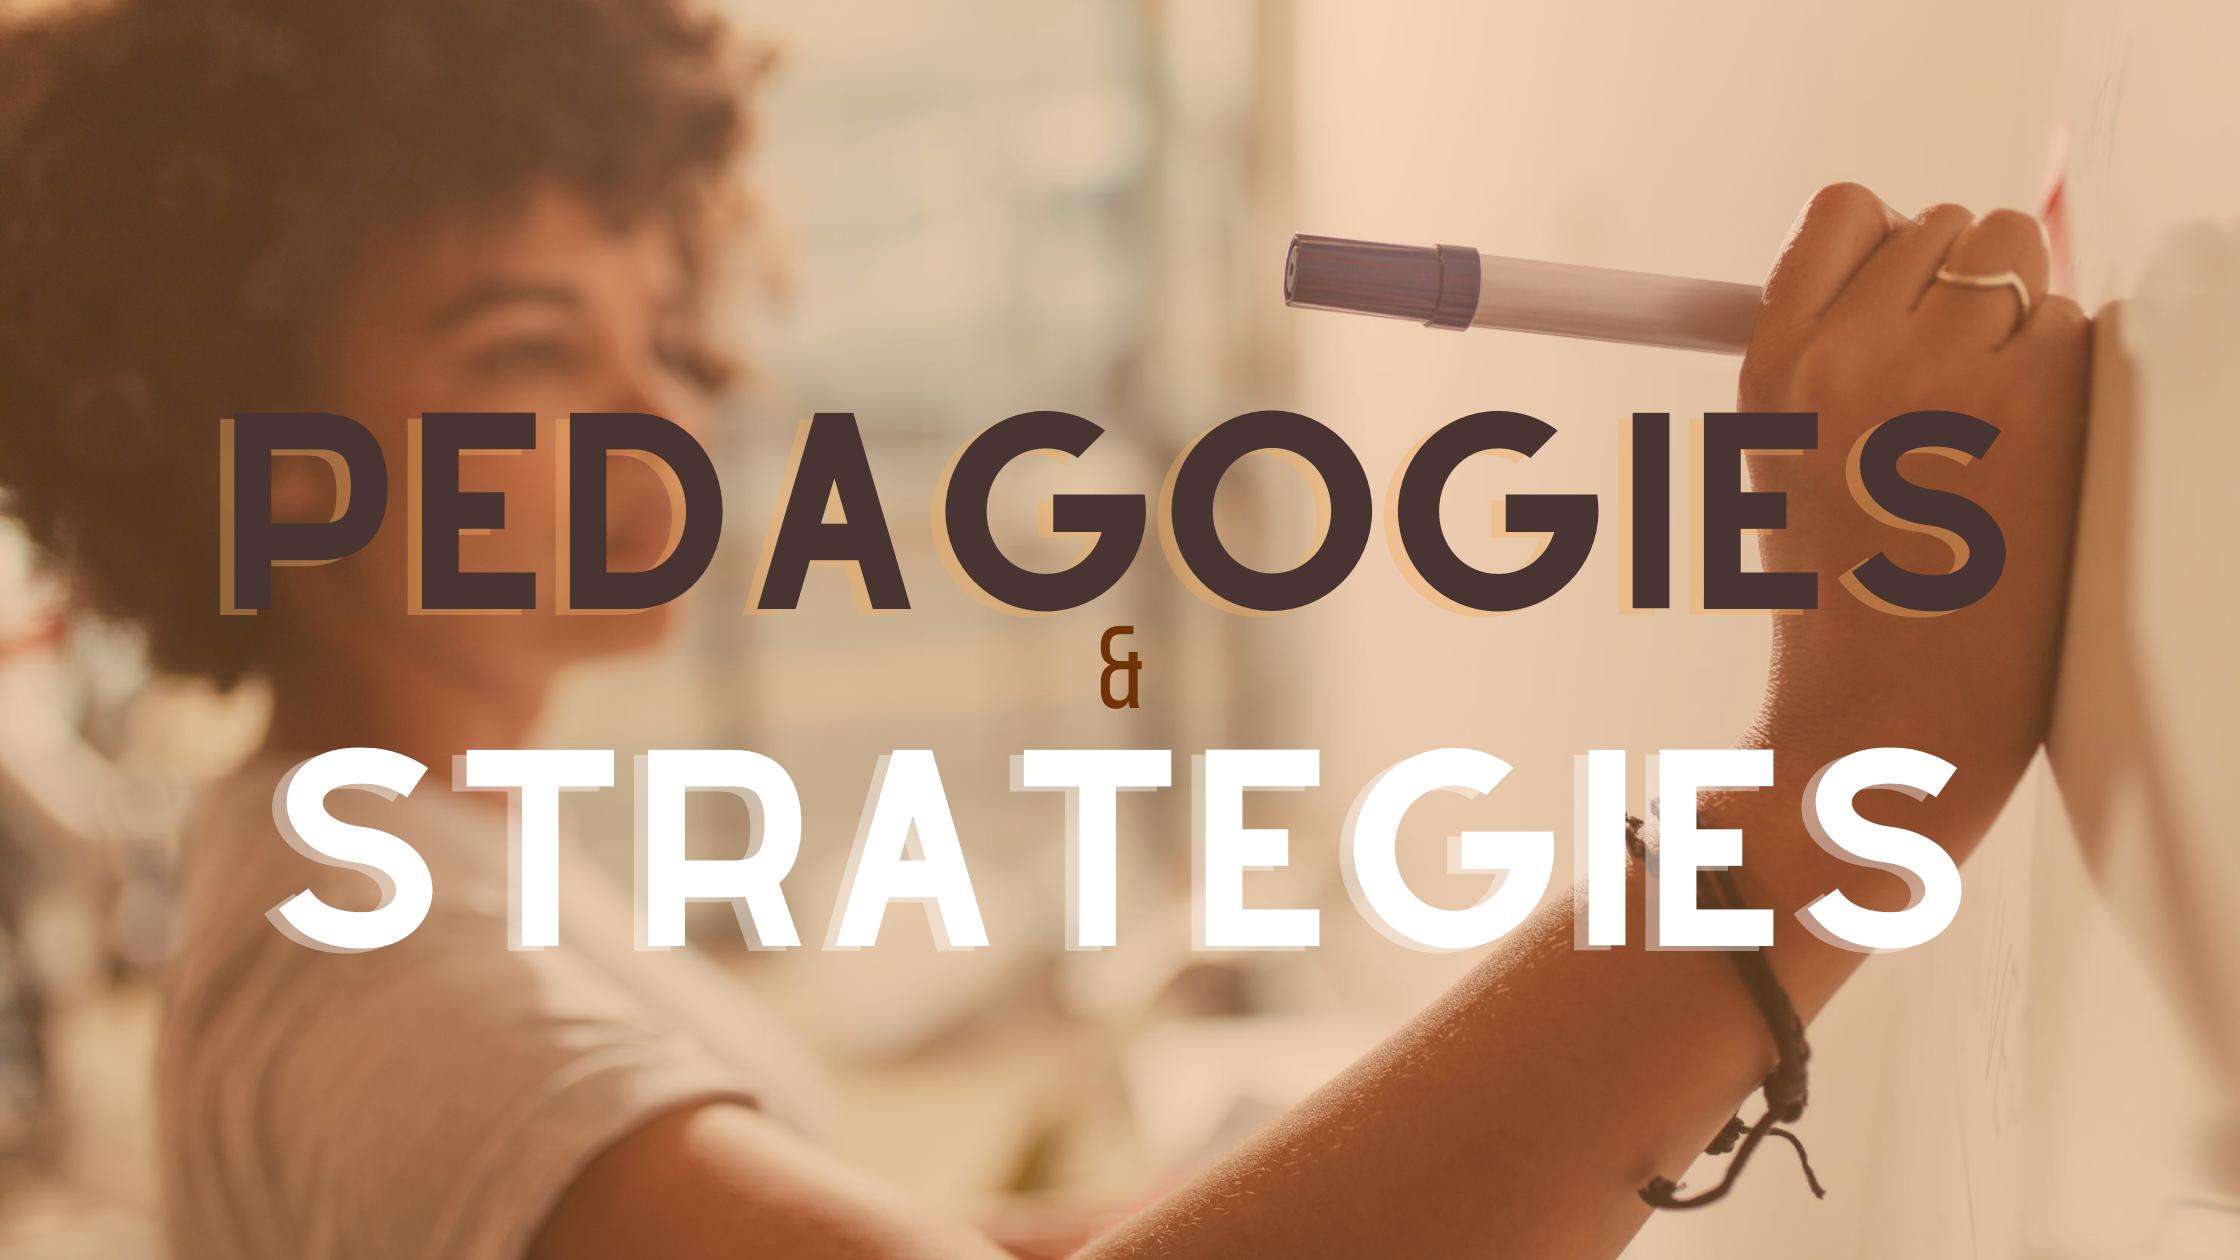 pedagogies and strategies